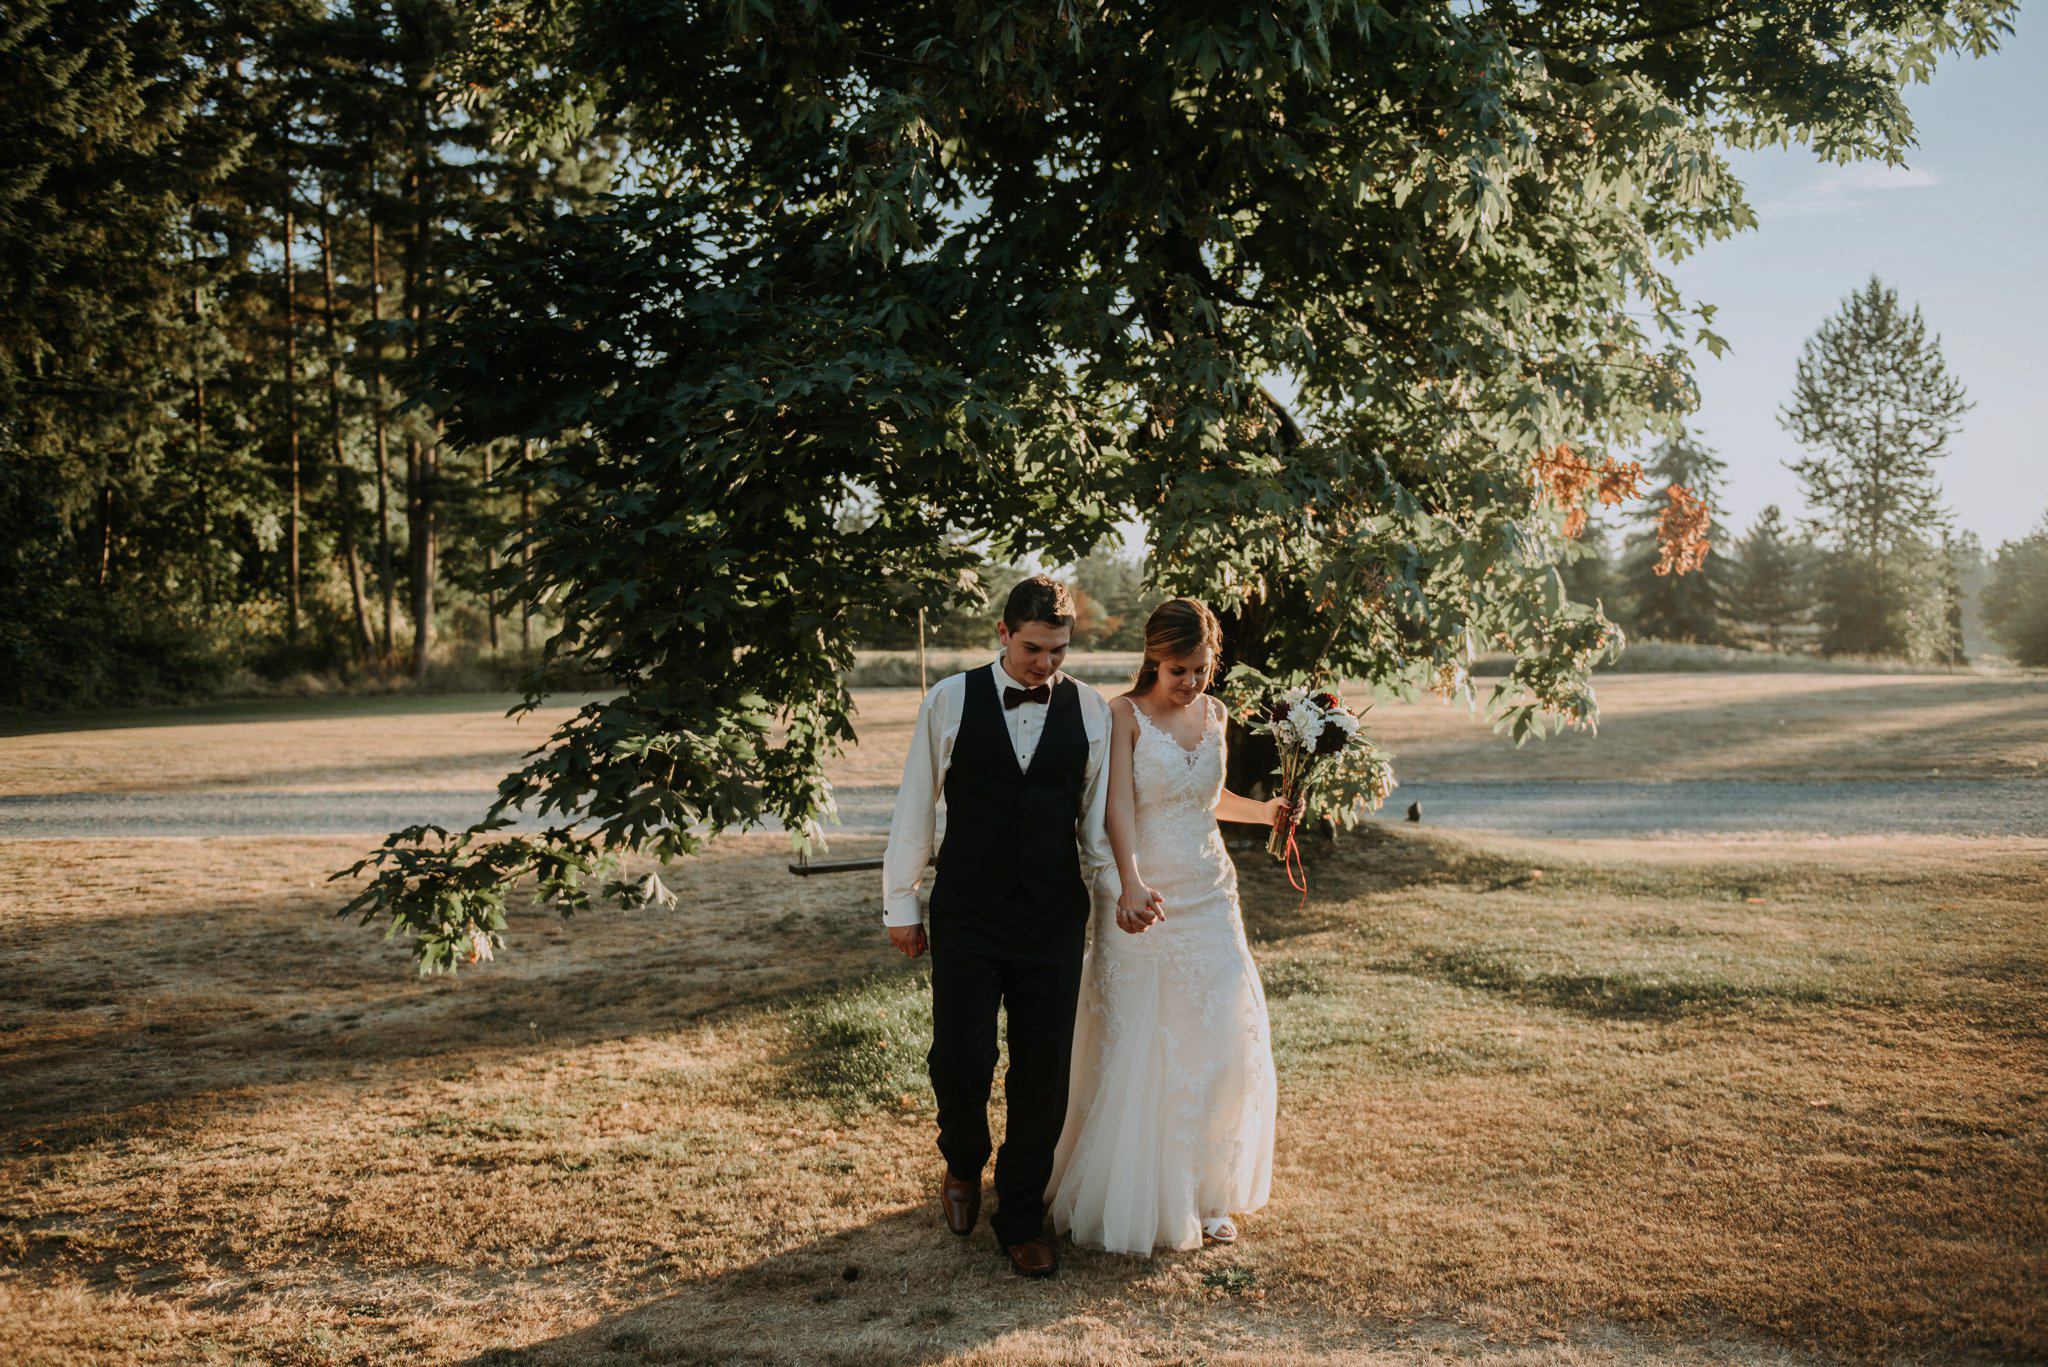 kristen-and-cody-the-kelley-farm-wedding-seattle-photographer-caitlyn-nikula-90.jpg